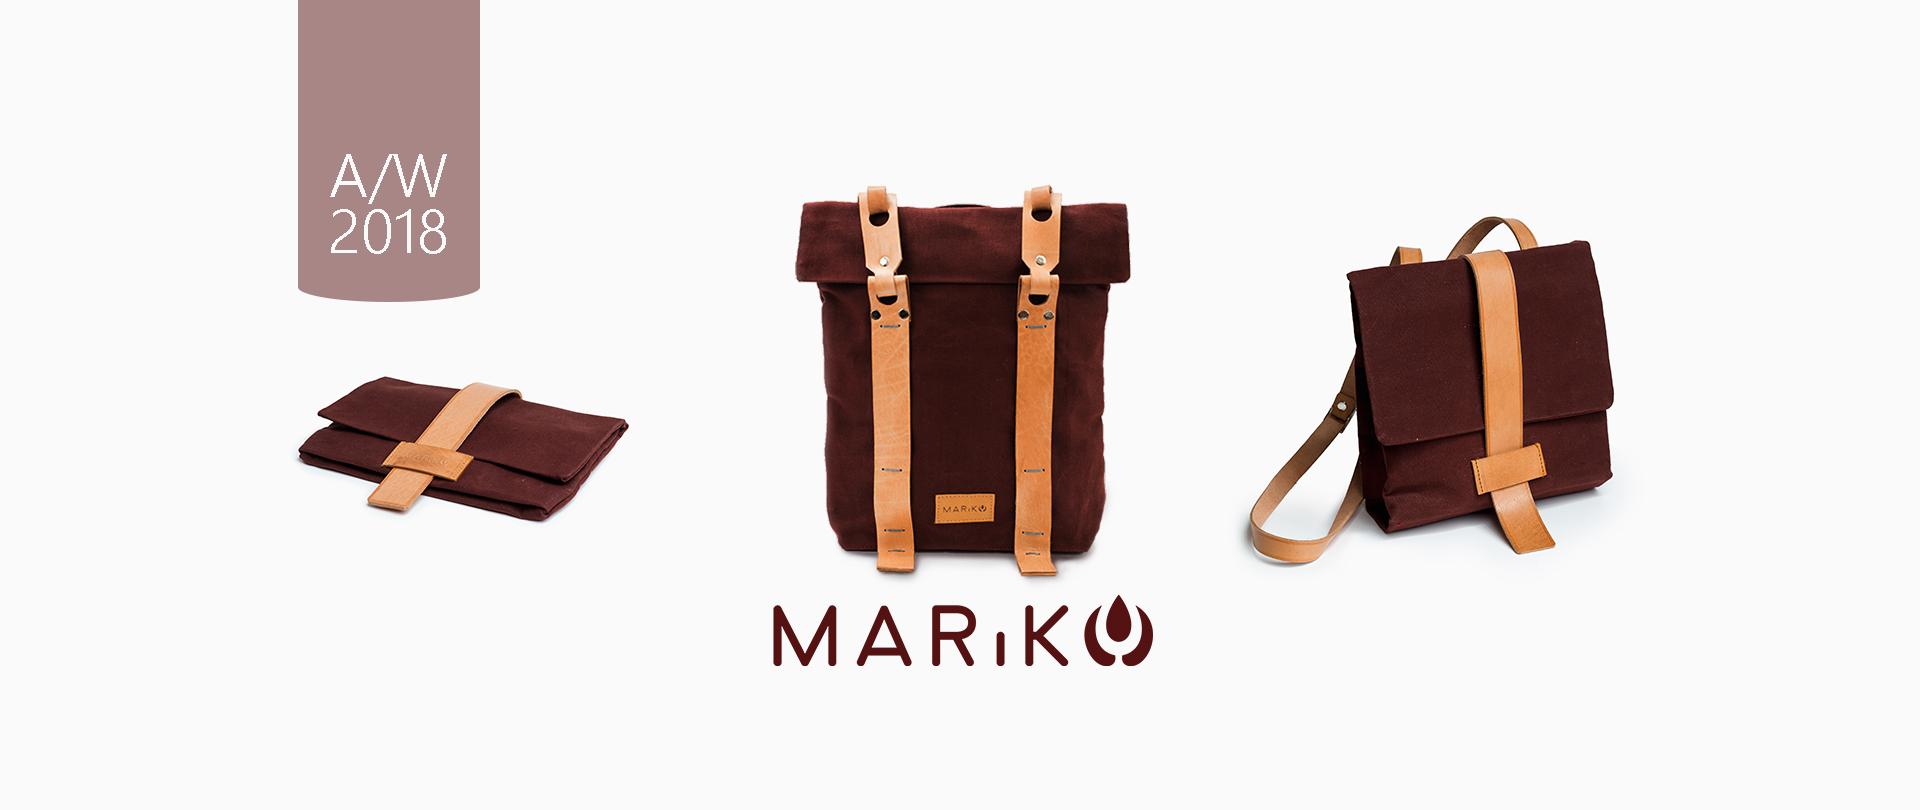 Marikó